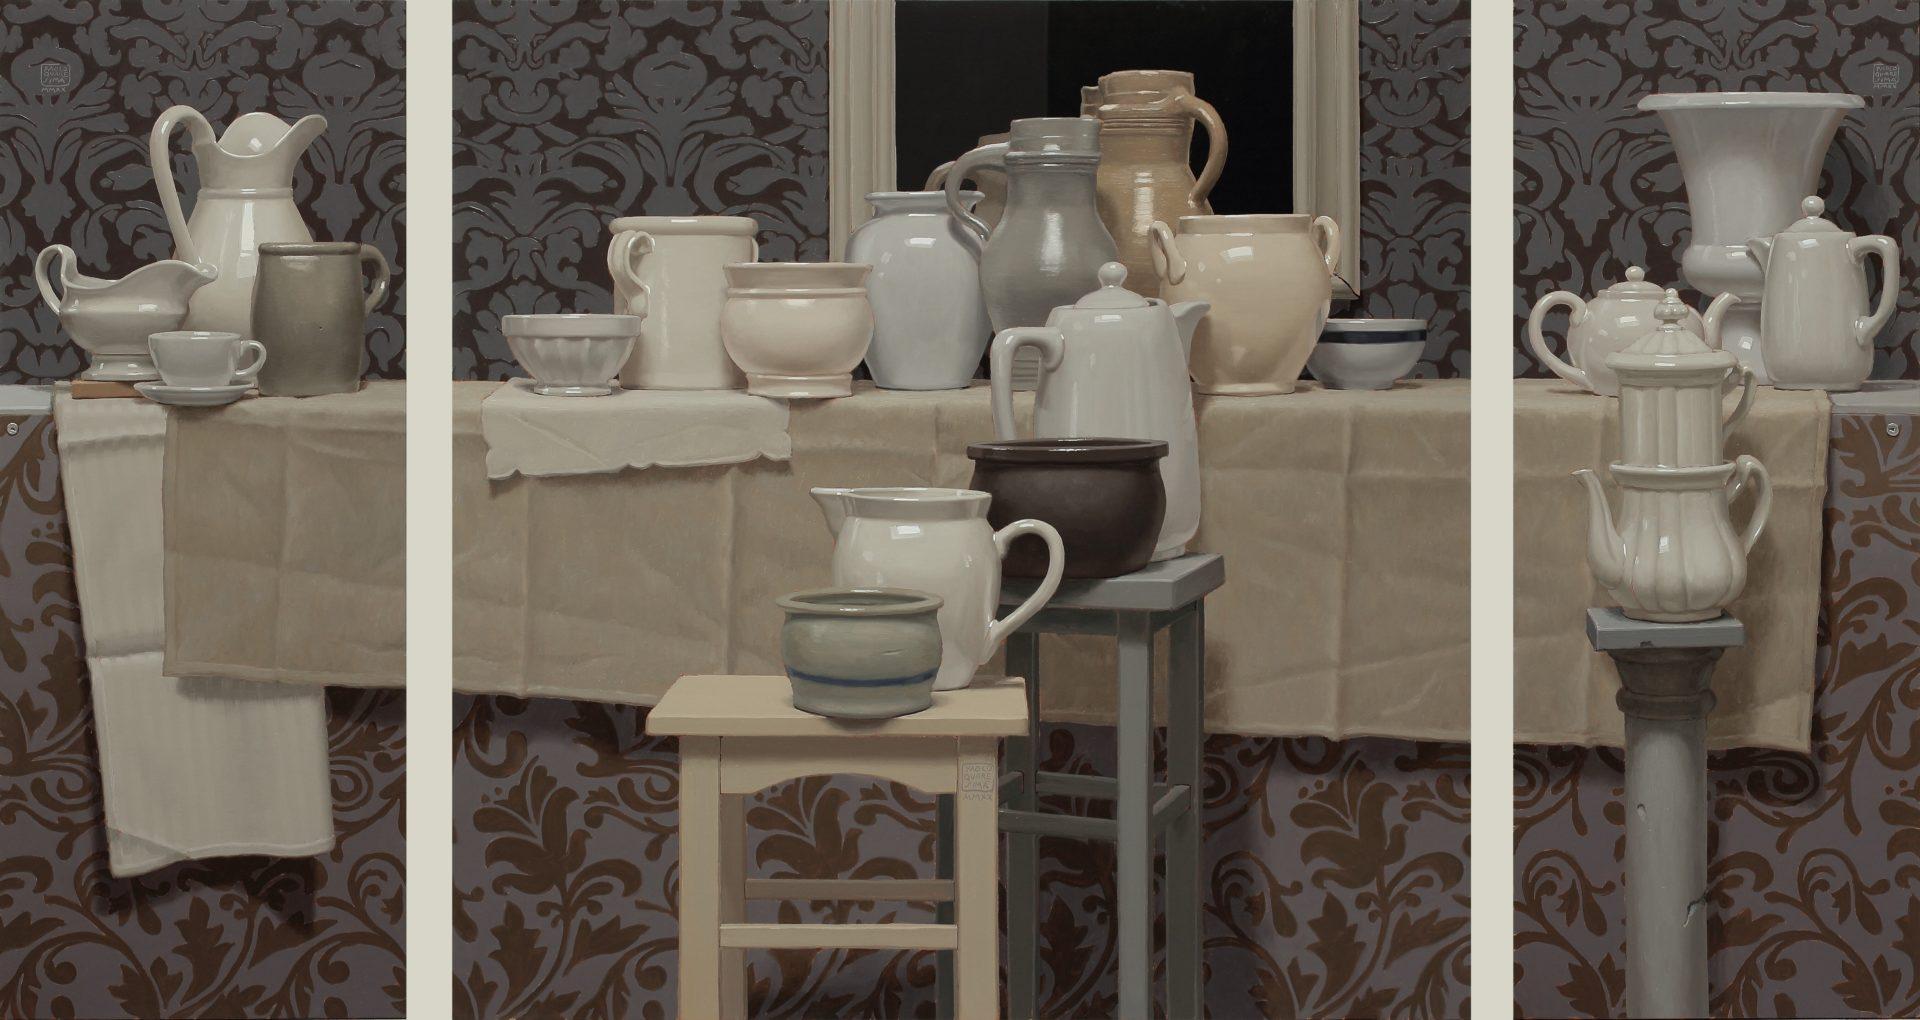 Galleria Forni – Paolo Quaresima – one artist show